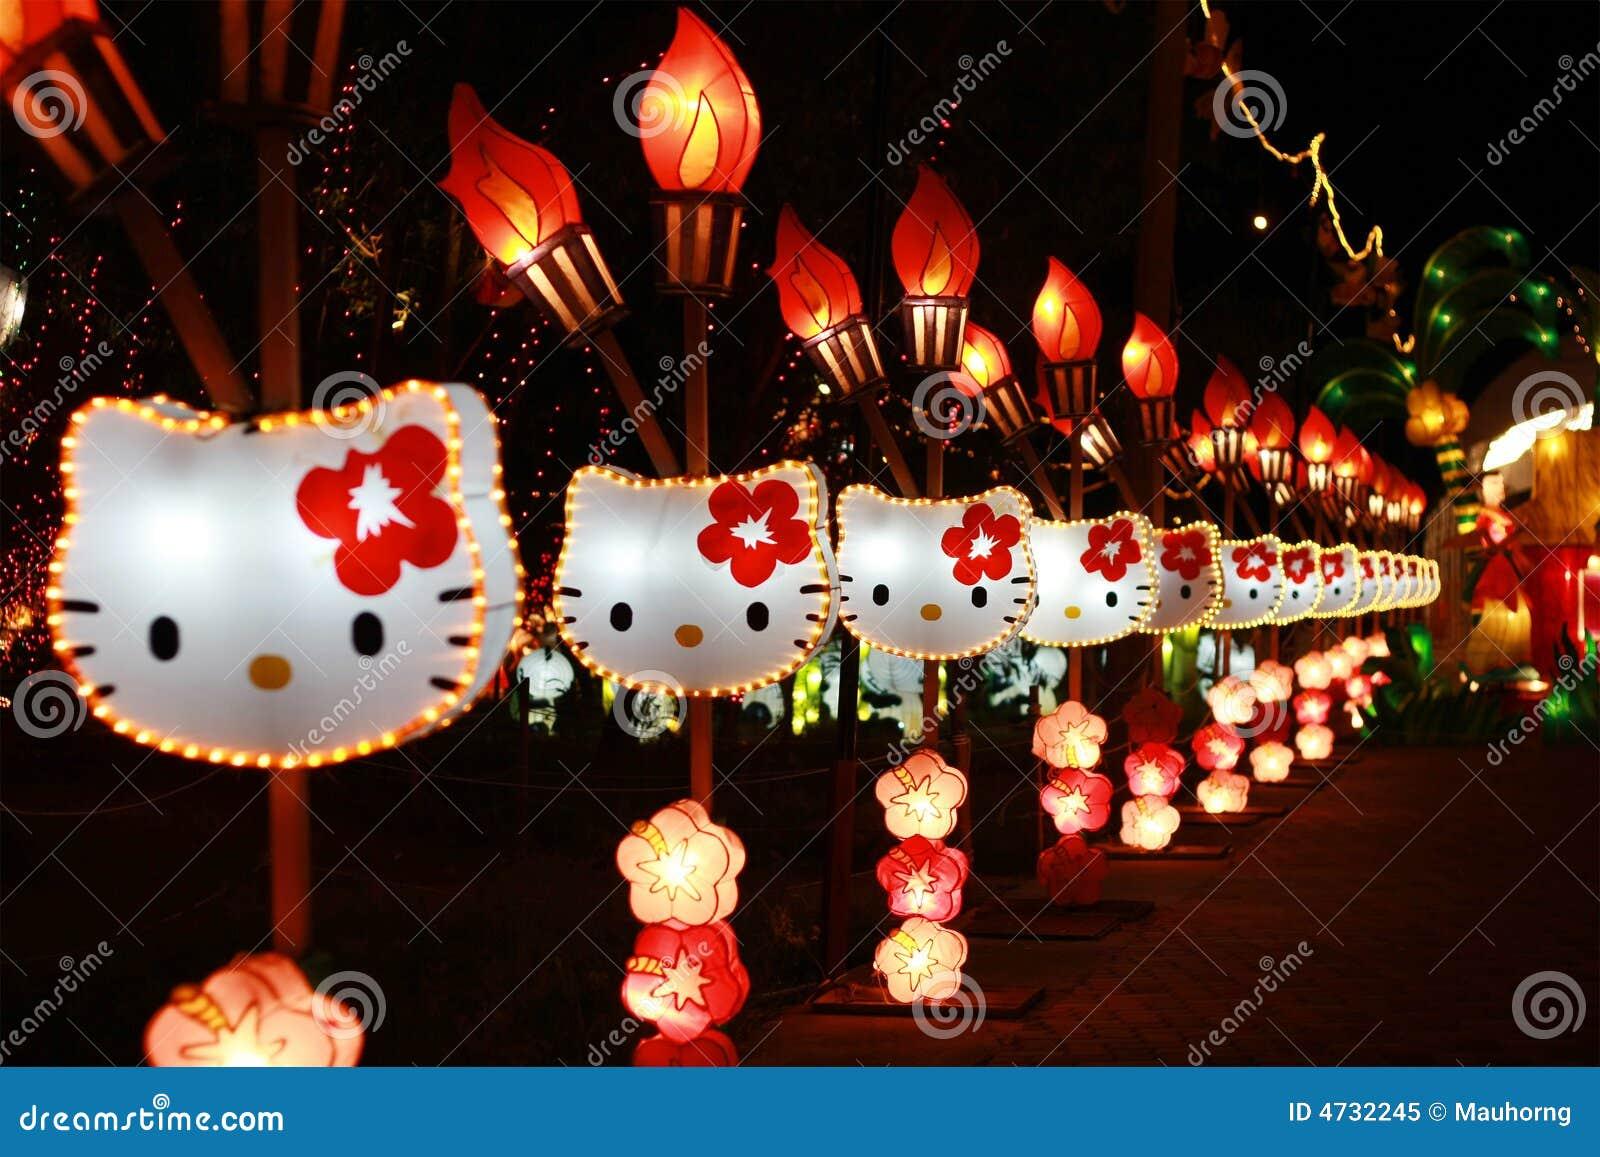 Bonjour lanterne de minou